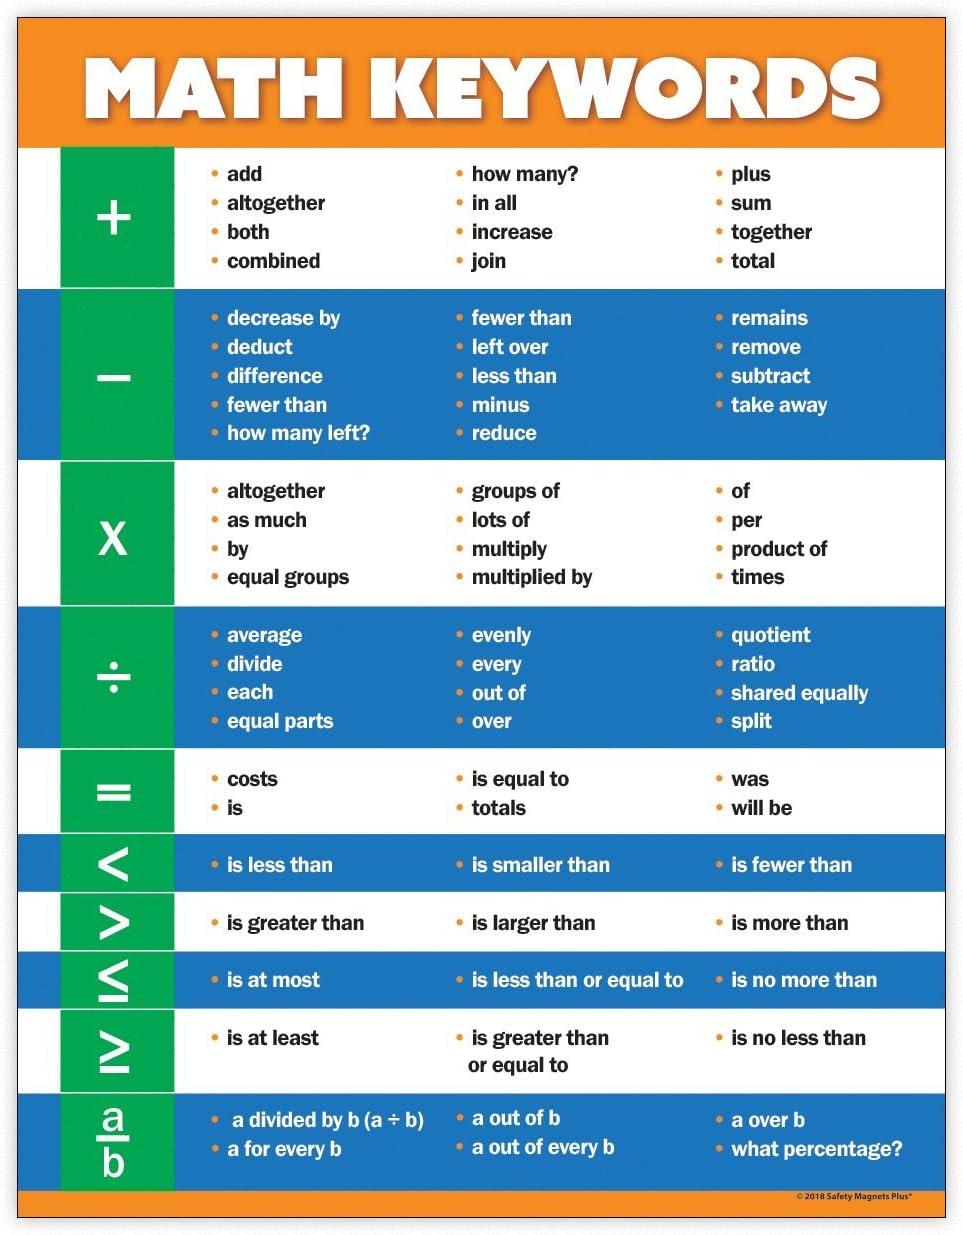 Middle School Math Posters - Math Keywords Classroom ...